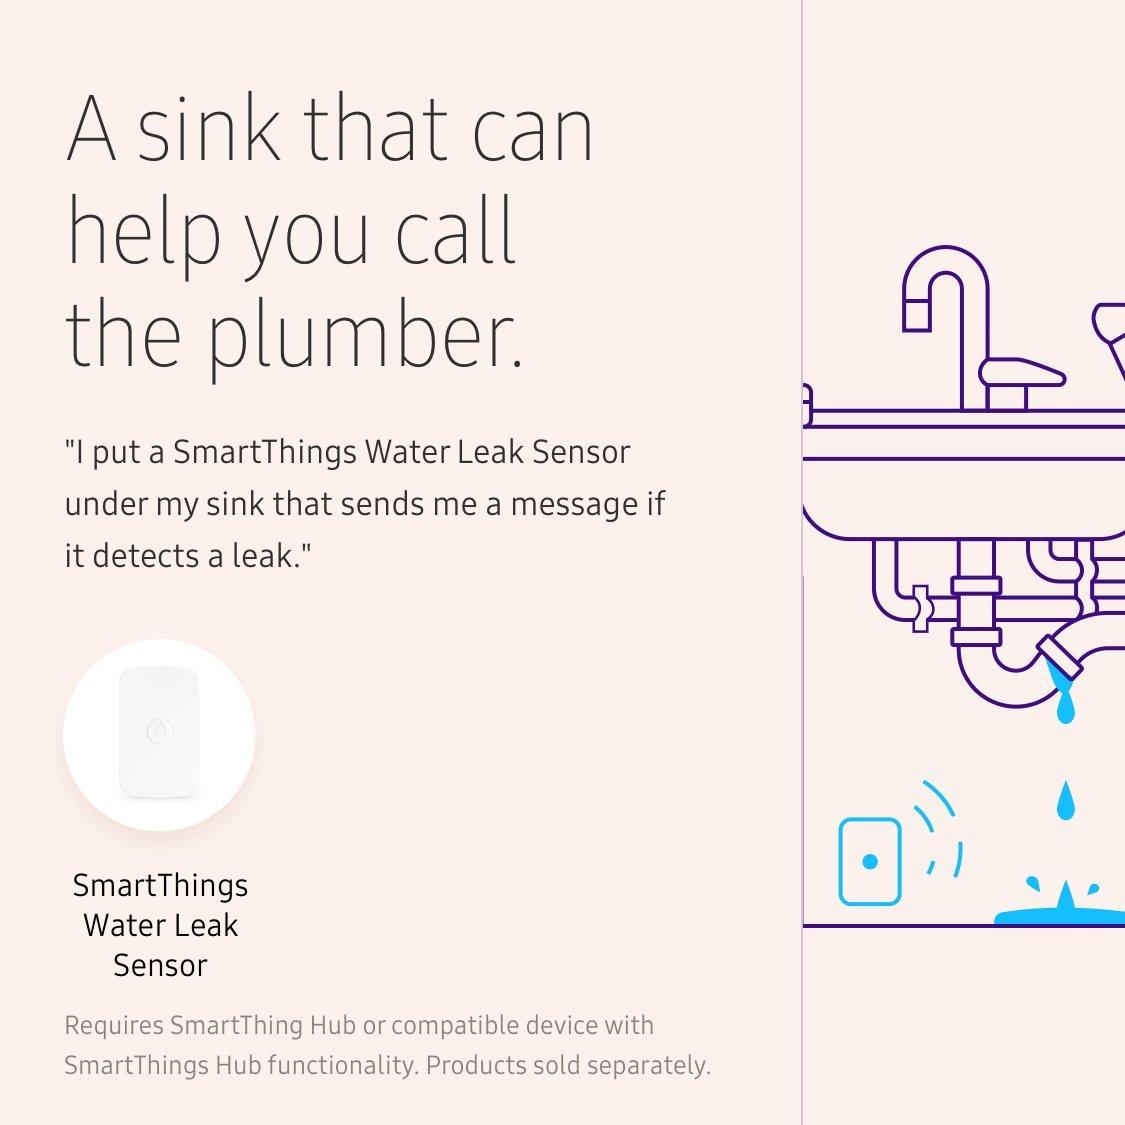 Samsung SmartThings Water Leak Sensor